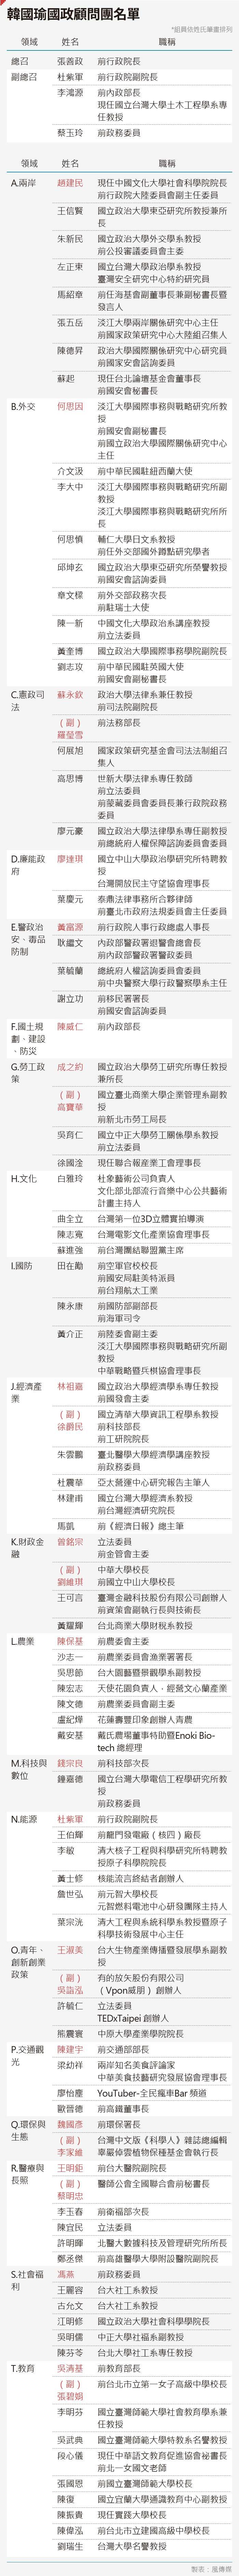 20190816-SMG0035-韓國瑜國政顧問團名單